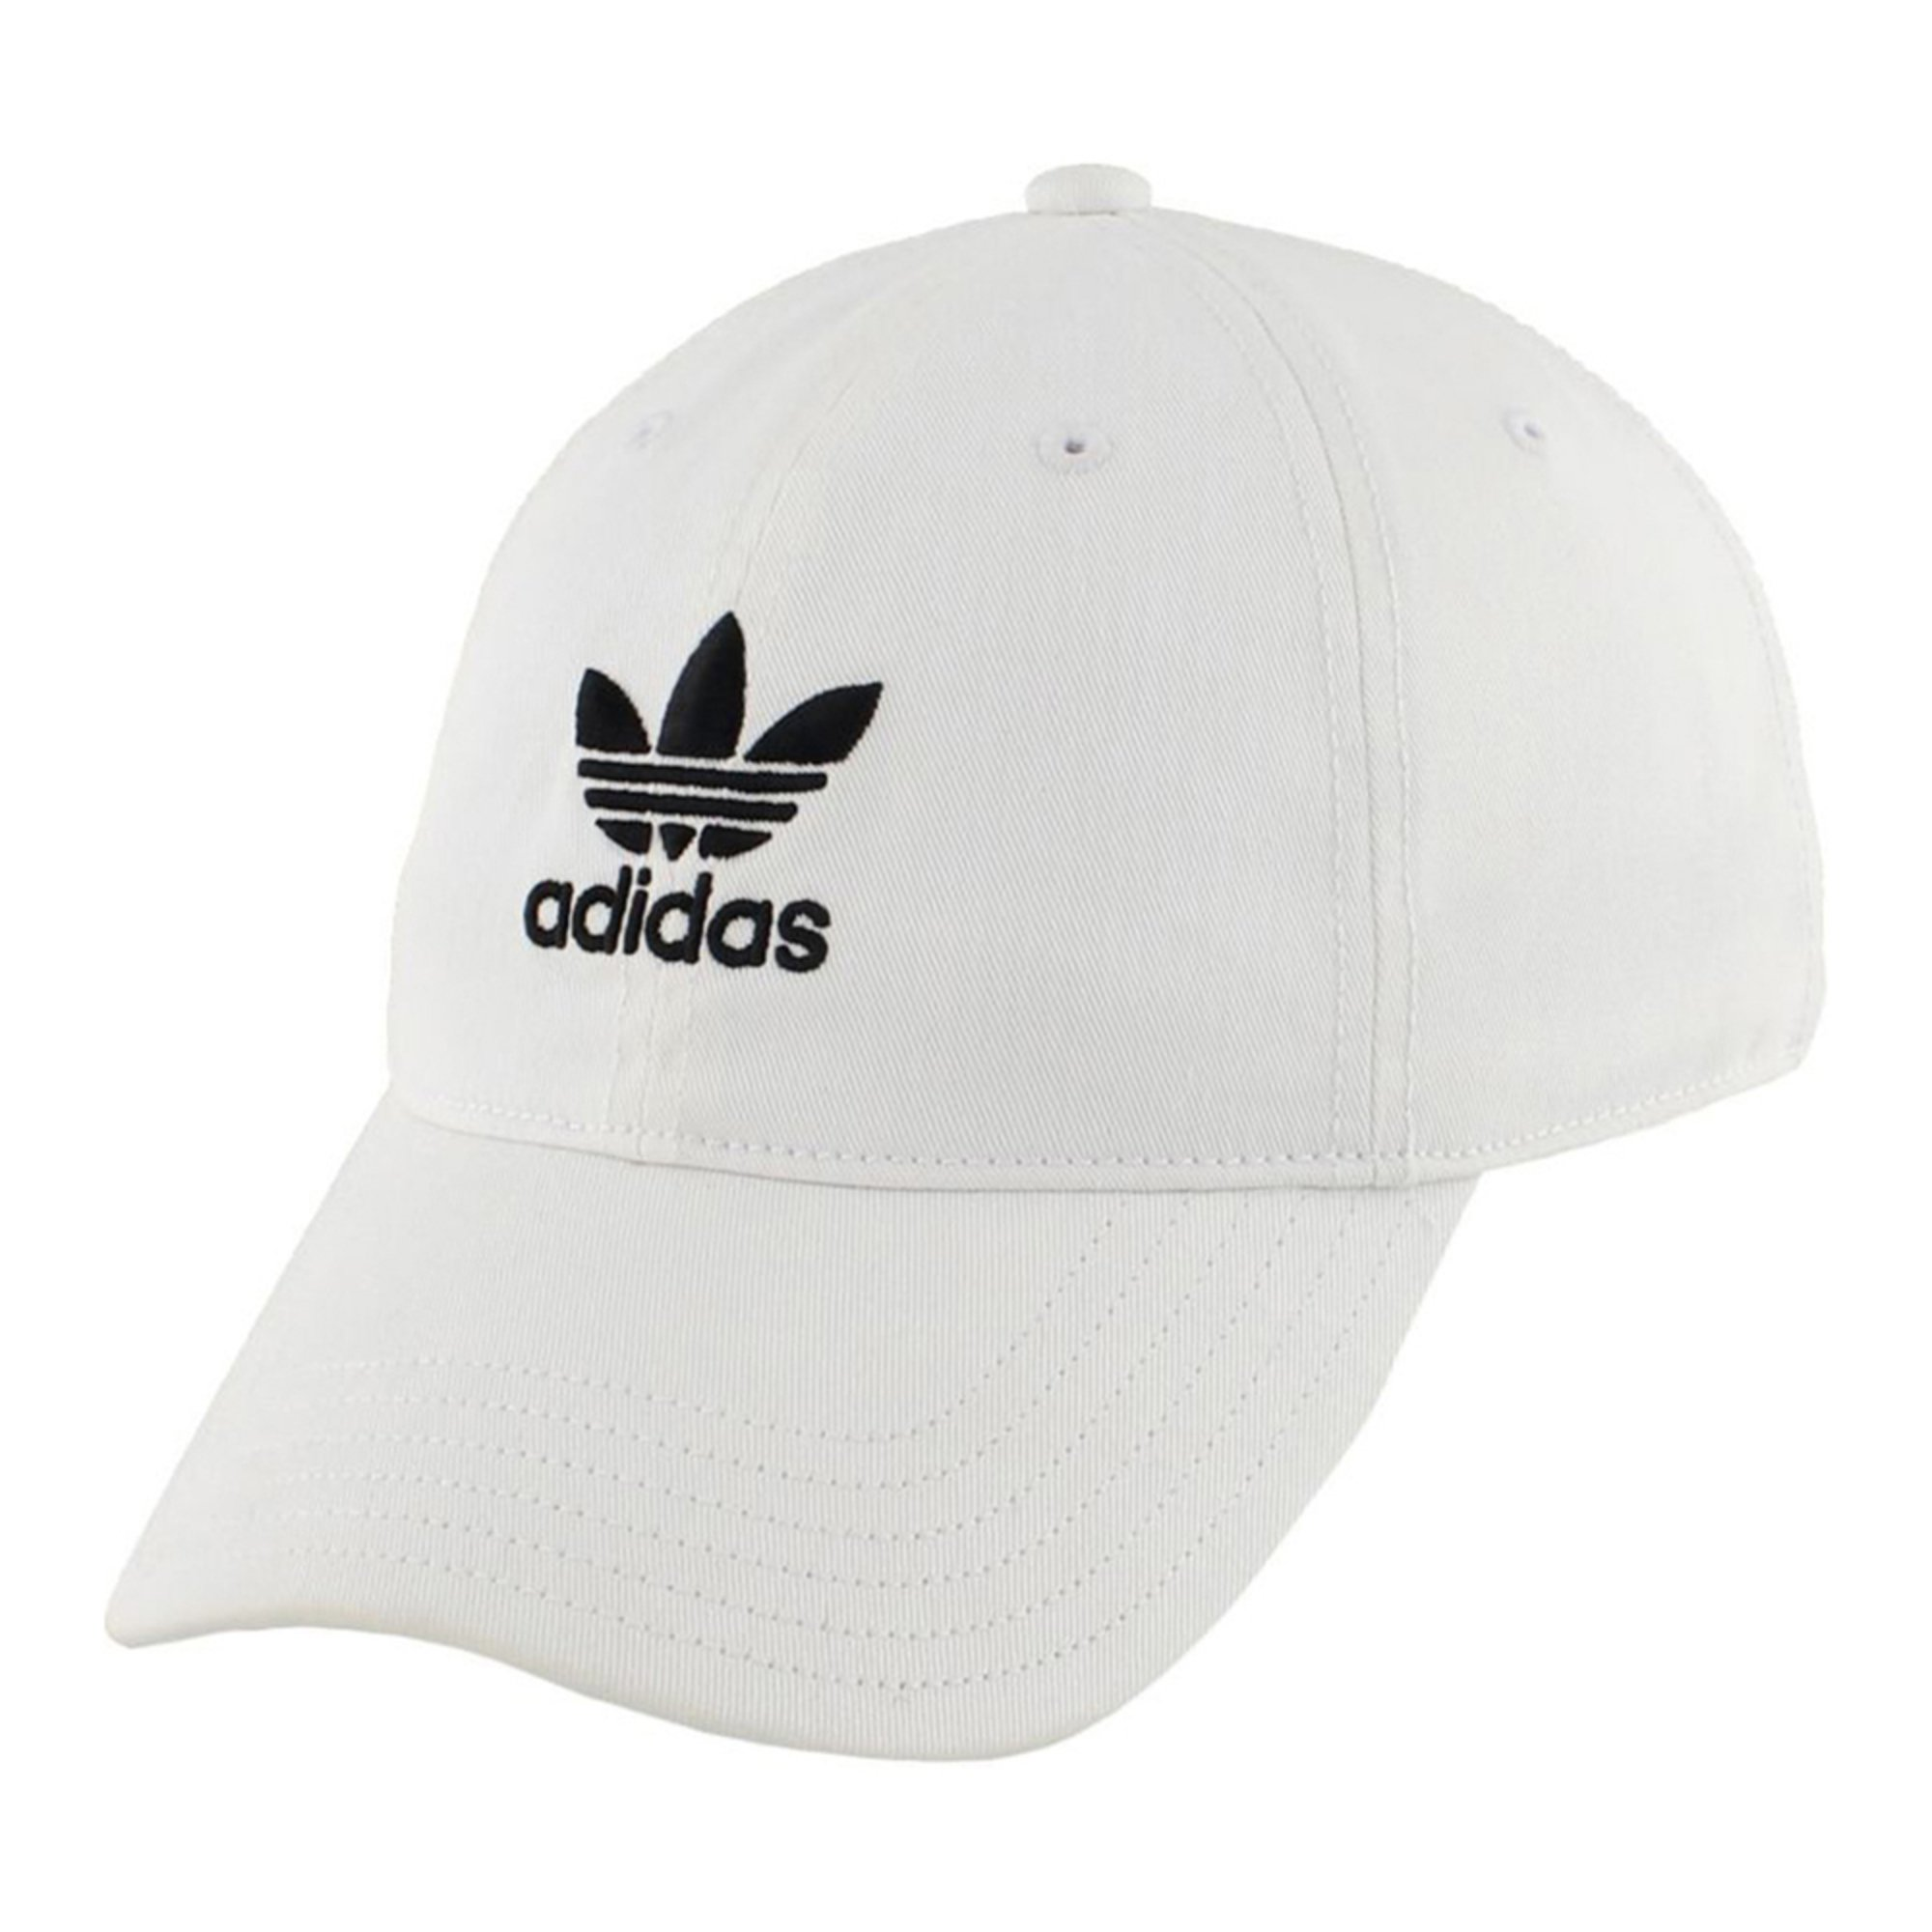 cc6250d1 Adidas Men's Originals Trefoil Relaxed Hat | Active Hats & Beanies ...